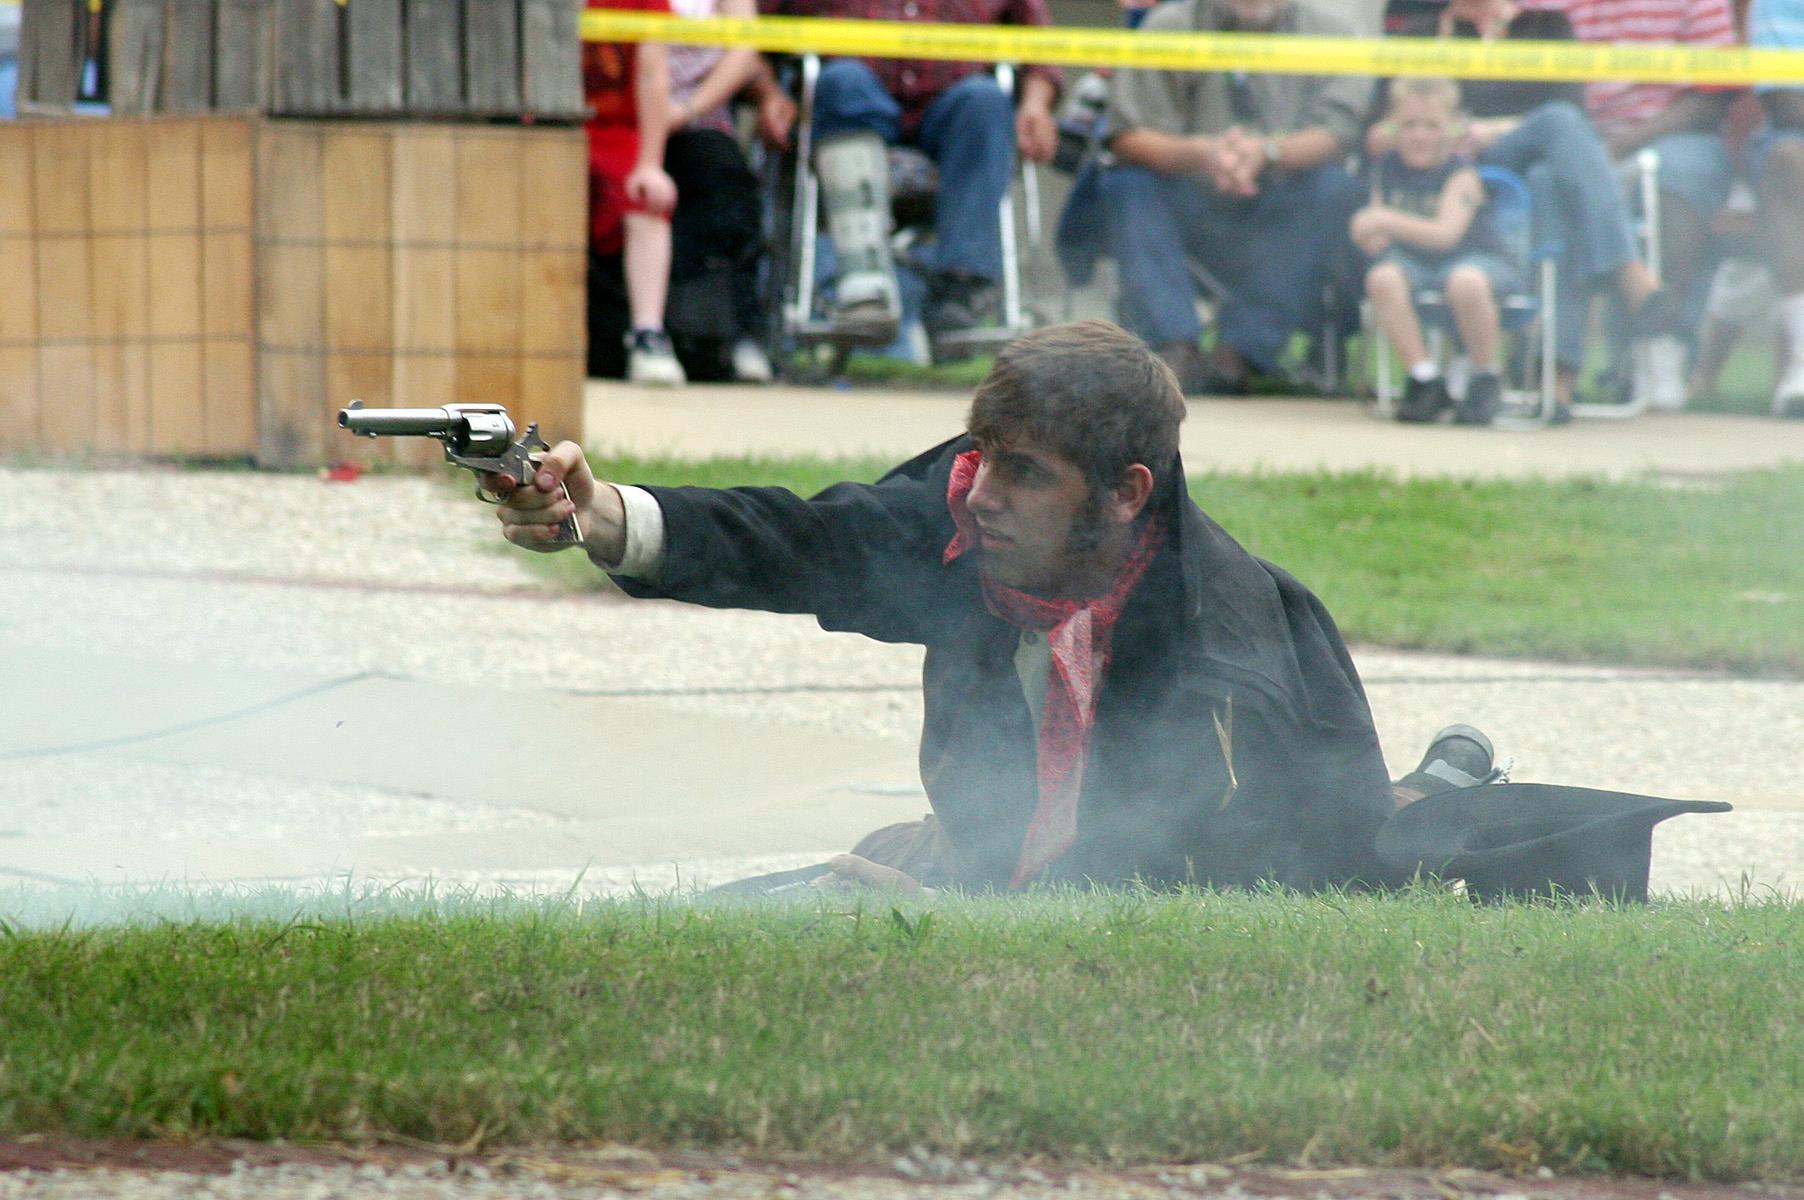 DALTON DEFENDERS DAYS, Coffeyville, Kansas